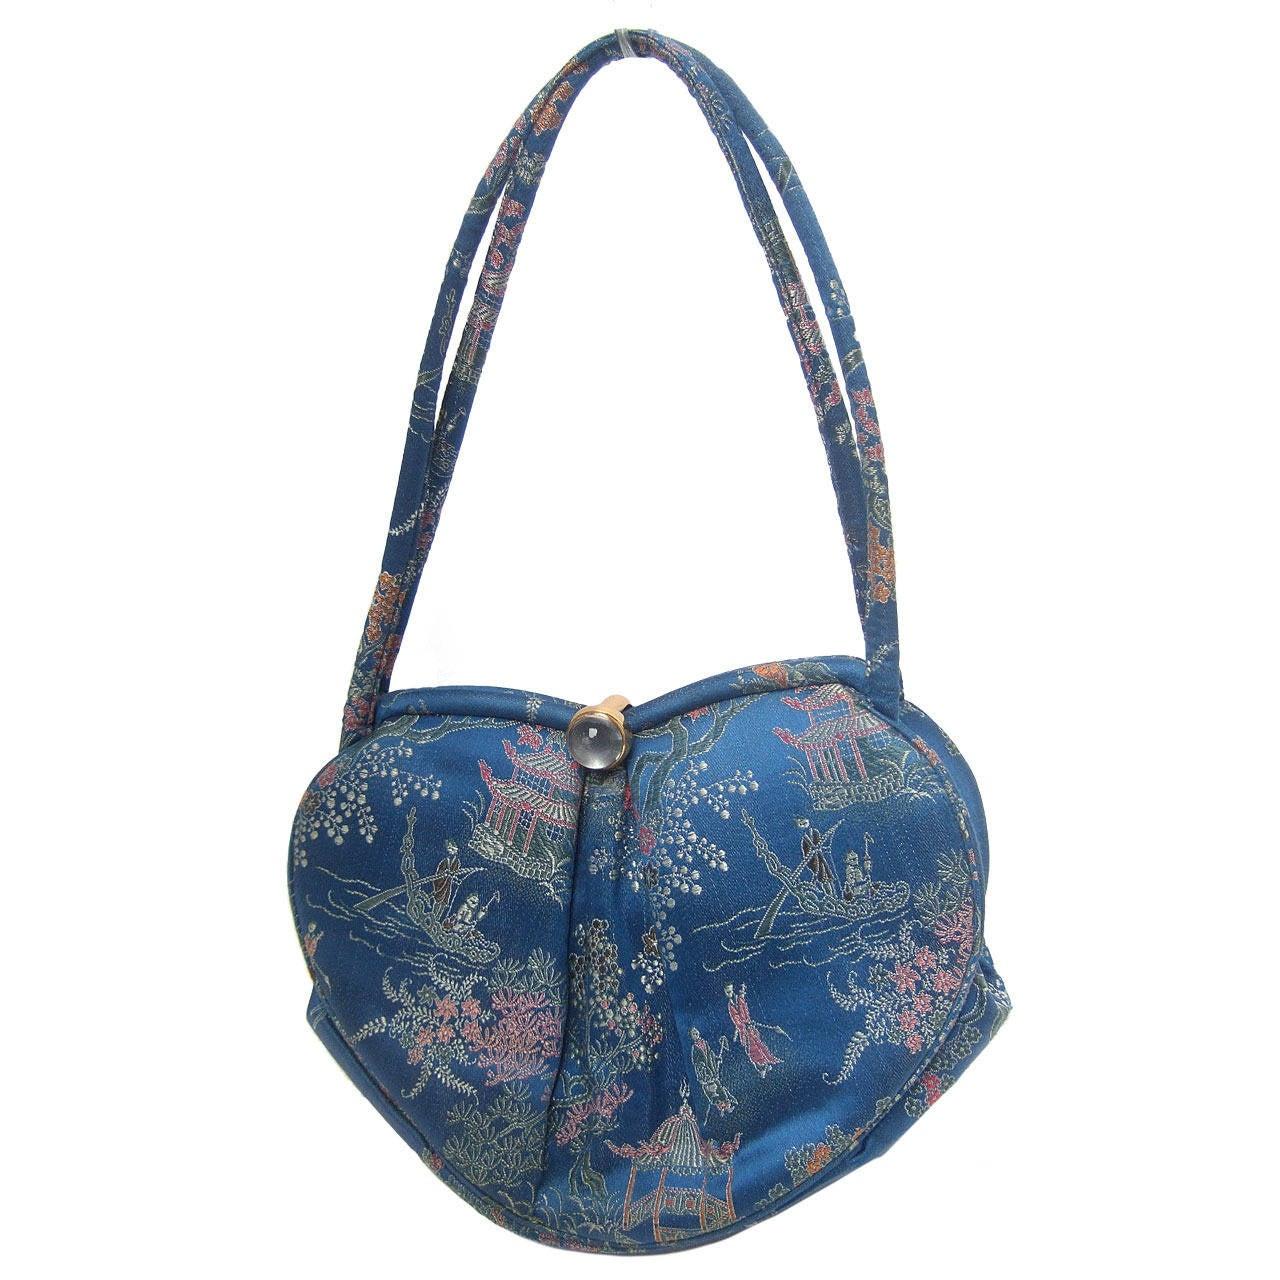 Saks Fifth Avenue Blue Satin Chinoiserie Handbag c 1960 For Sale ...